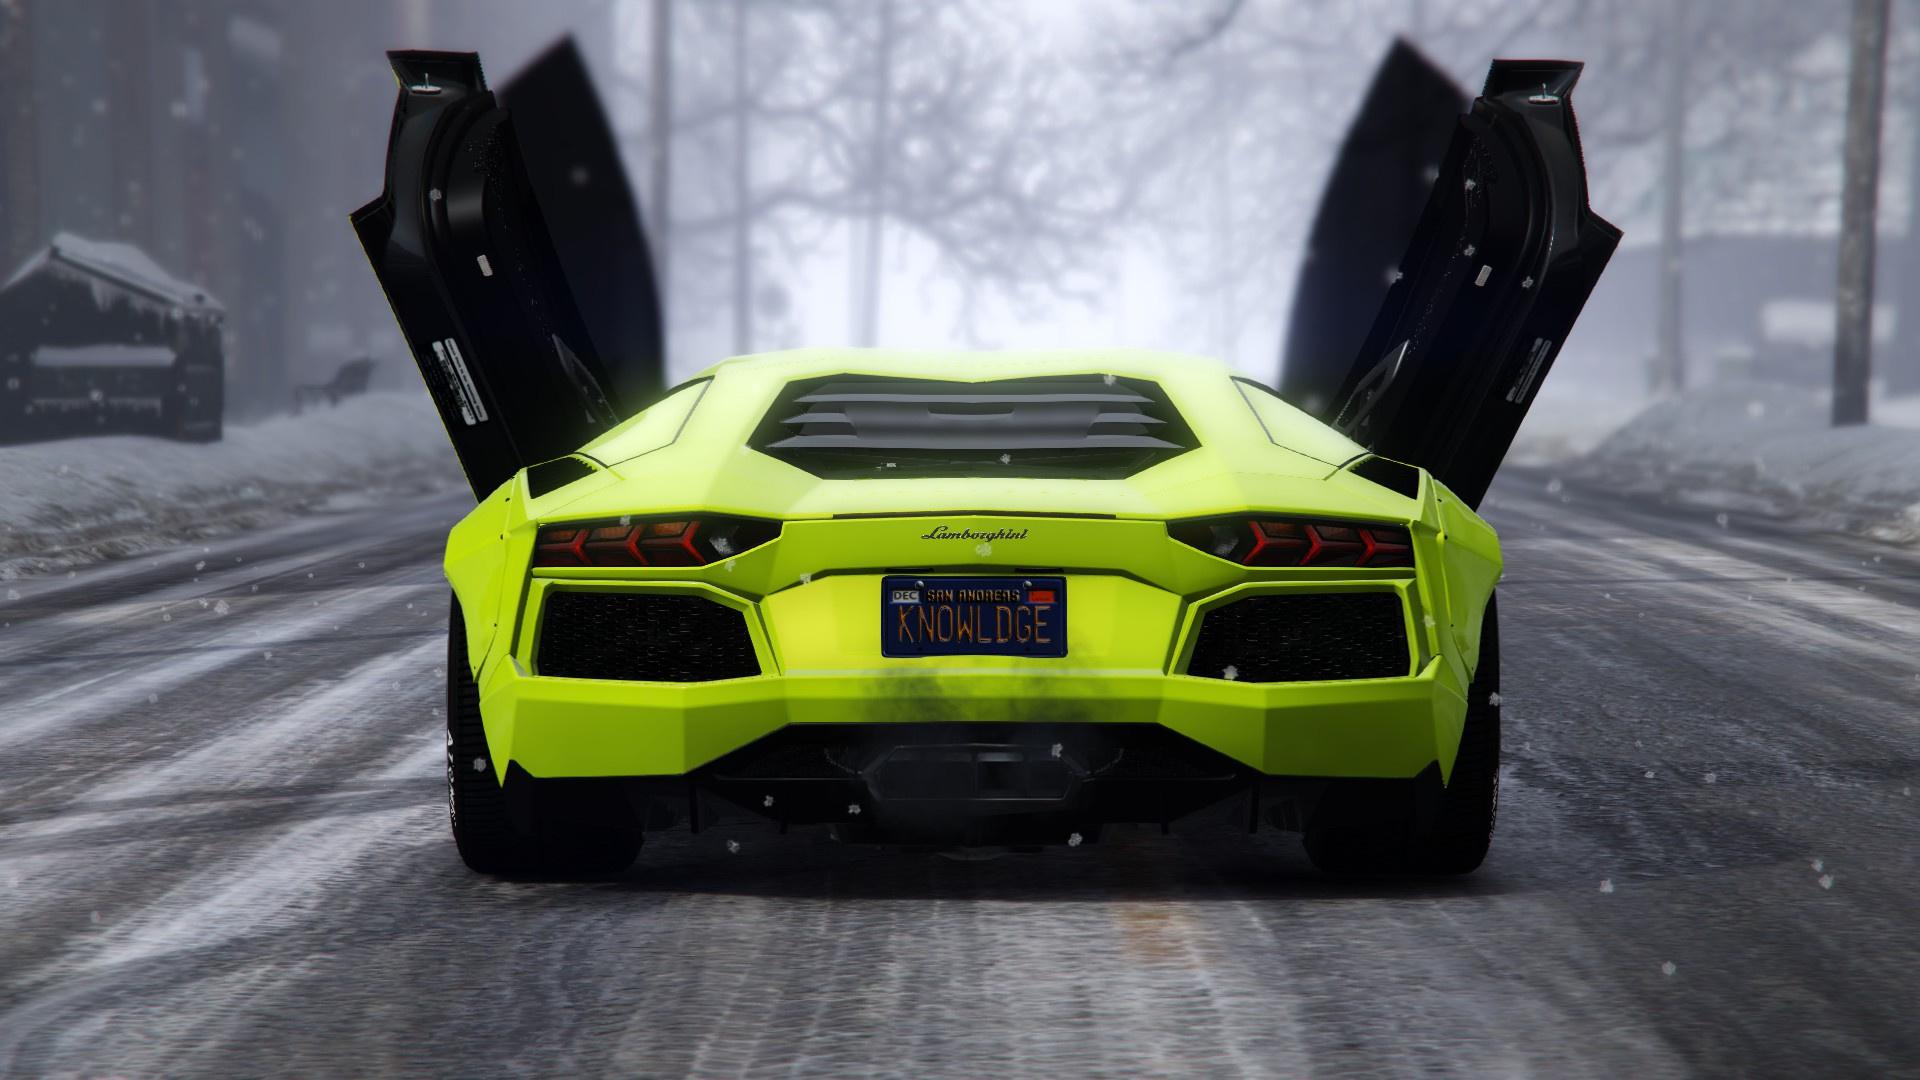 Fluorescent Colors Pack For Lamborghini Aventador Libertywalk Gta5 Mods Com